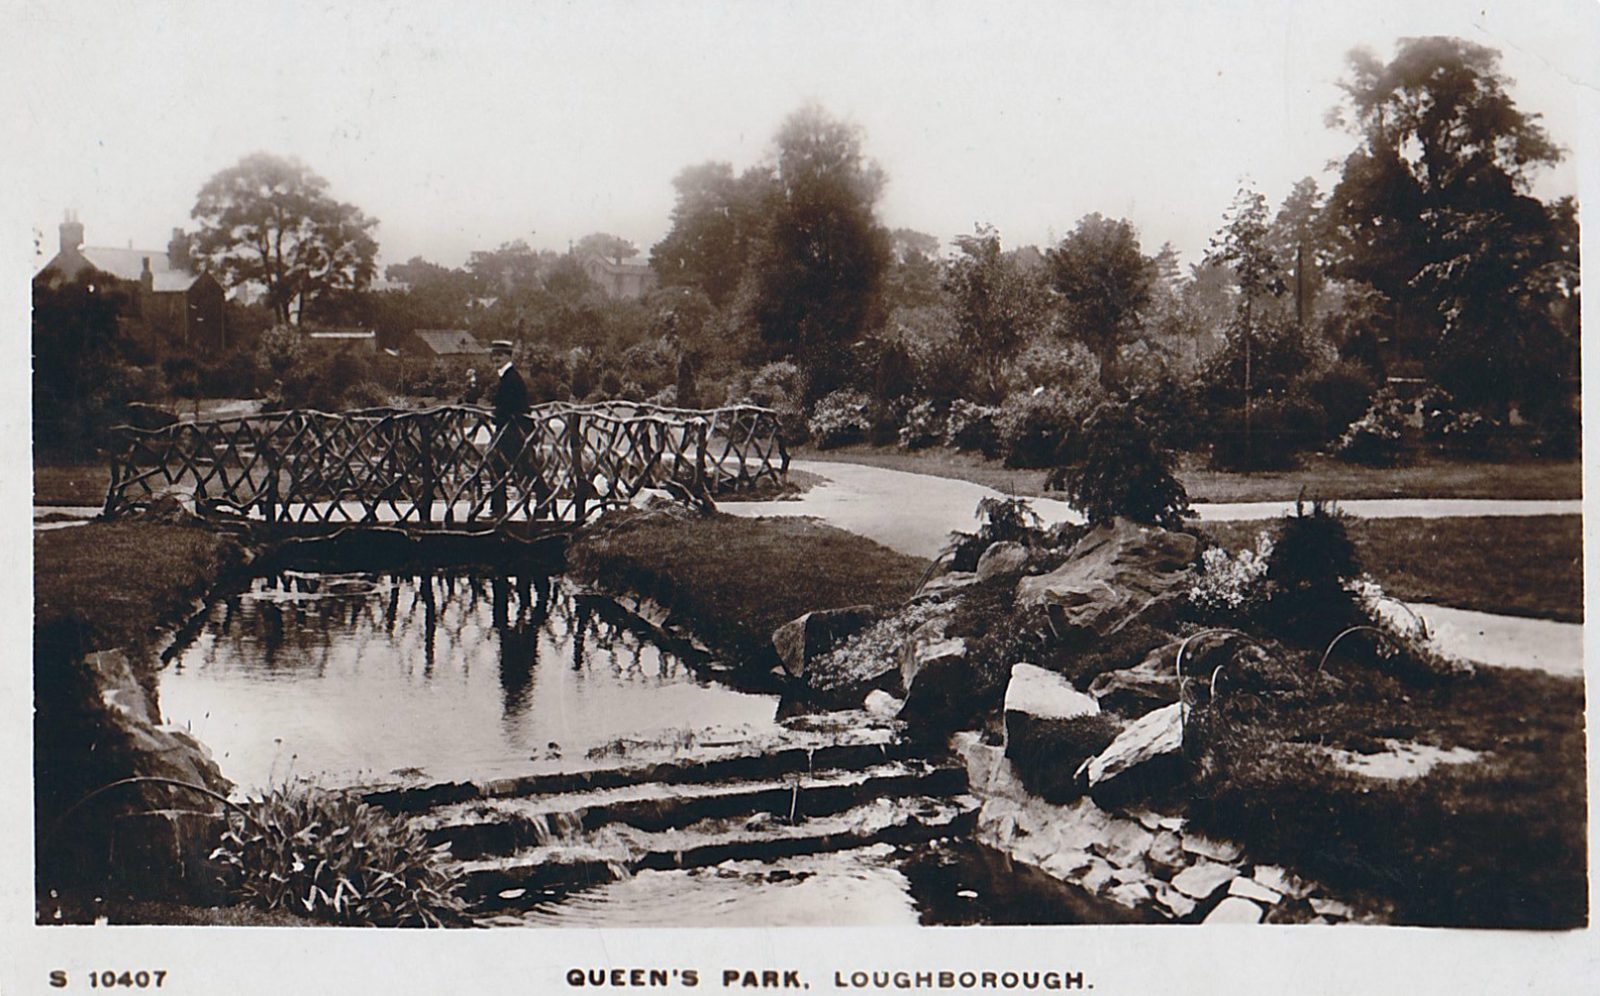 Queens Park, Loughborough. 1901-1920: Pond and rustic bridge. Franked 1916 (File:1449)